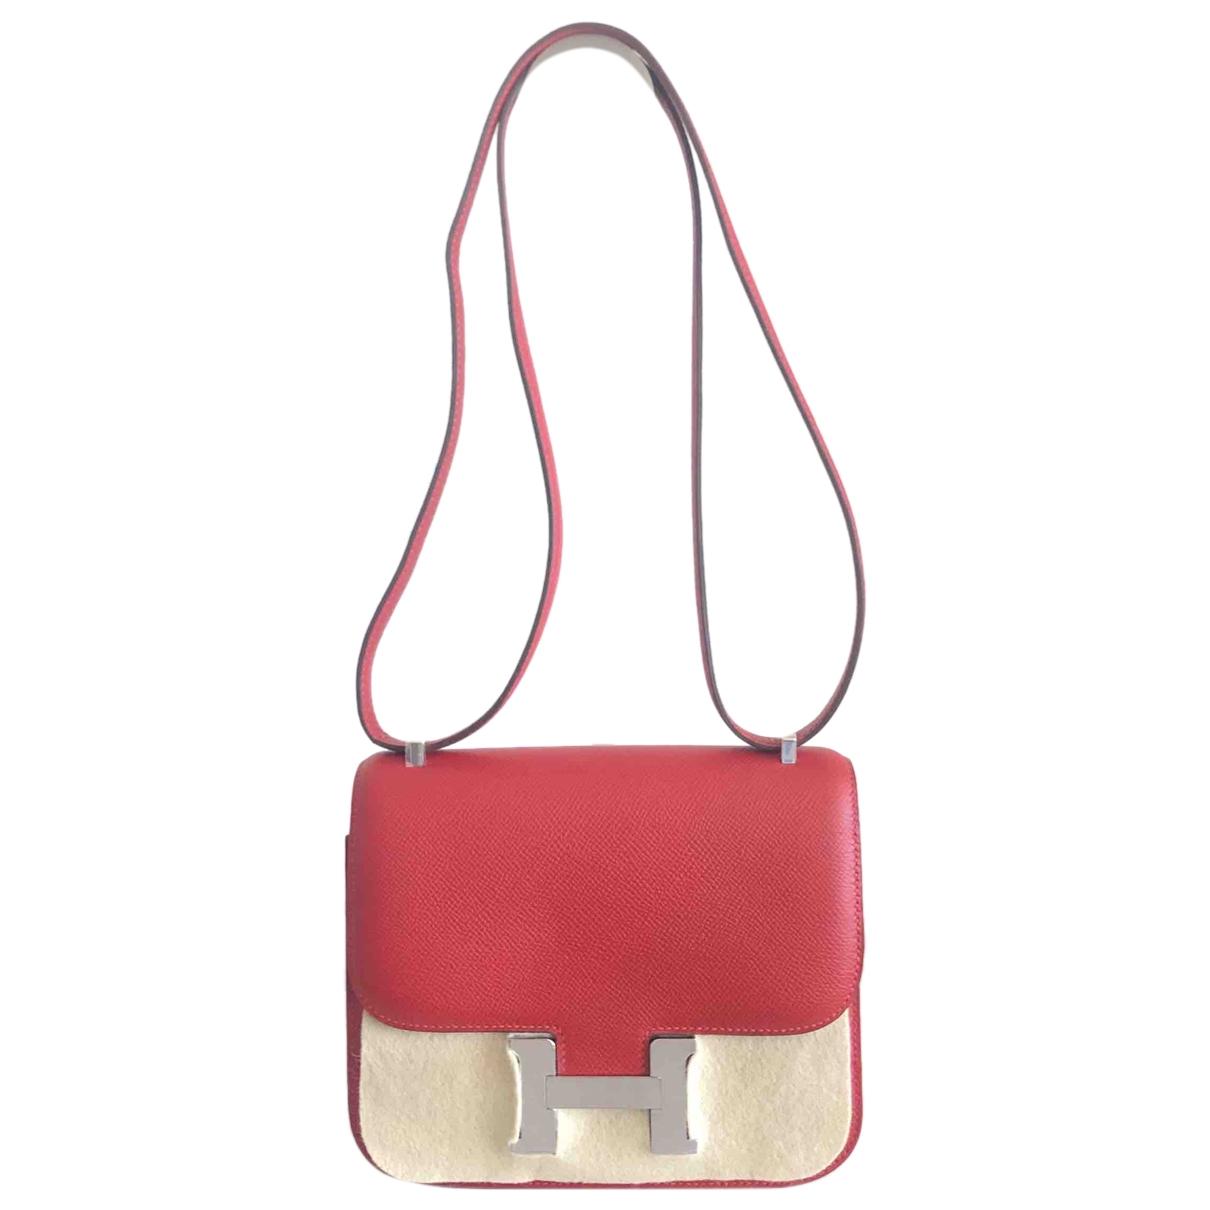 Hermès Constance Red Leather handbag for Women N